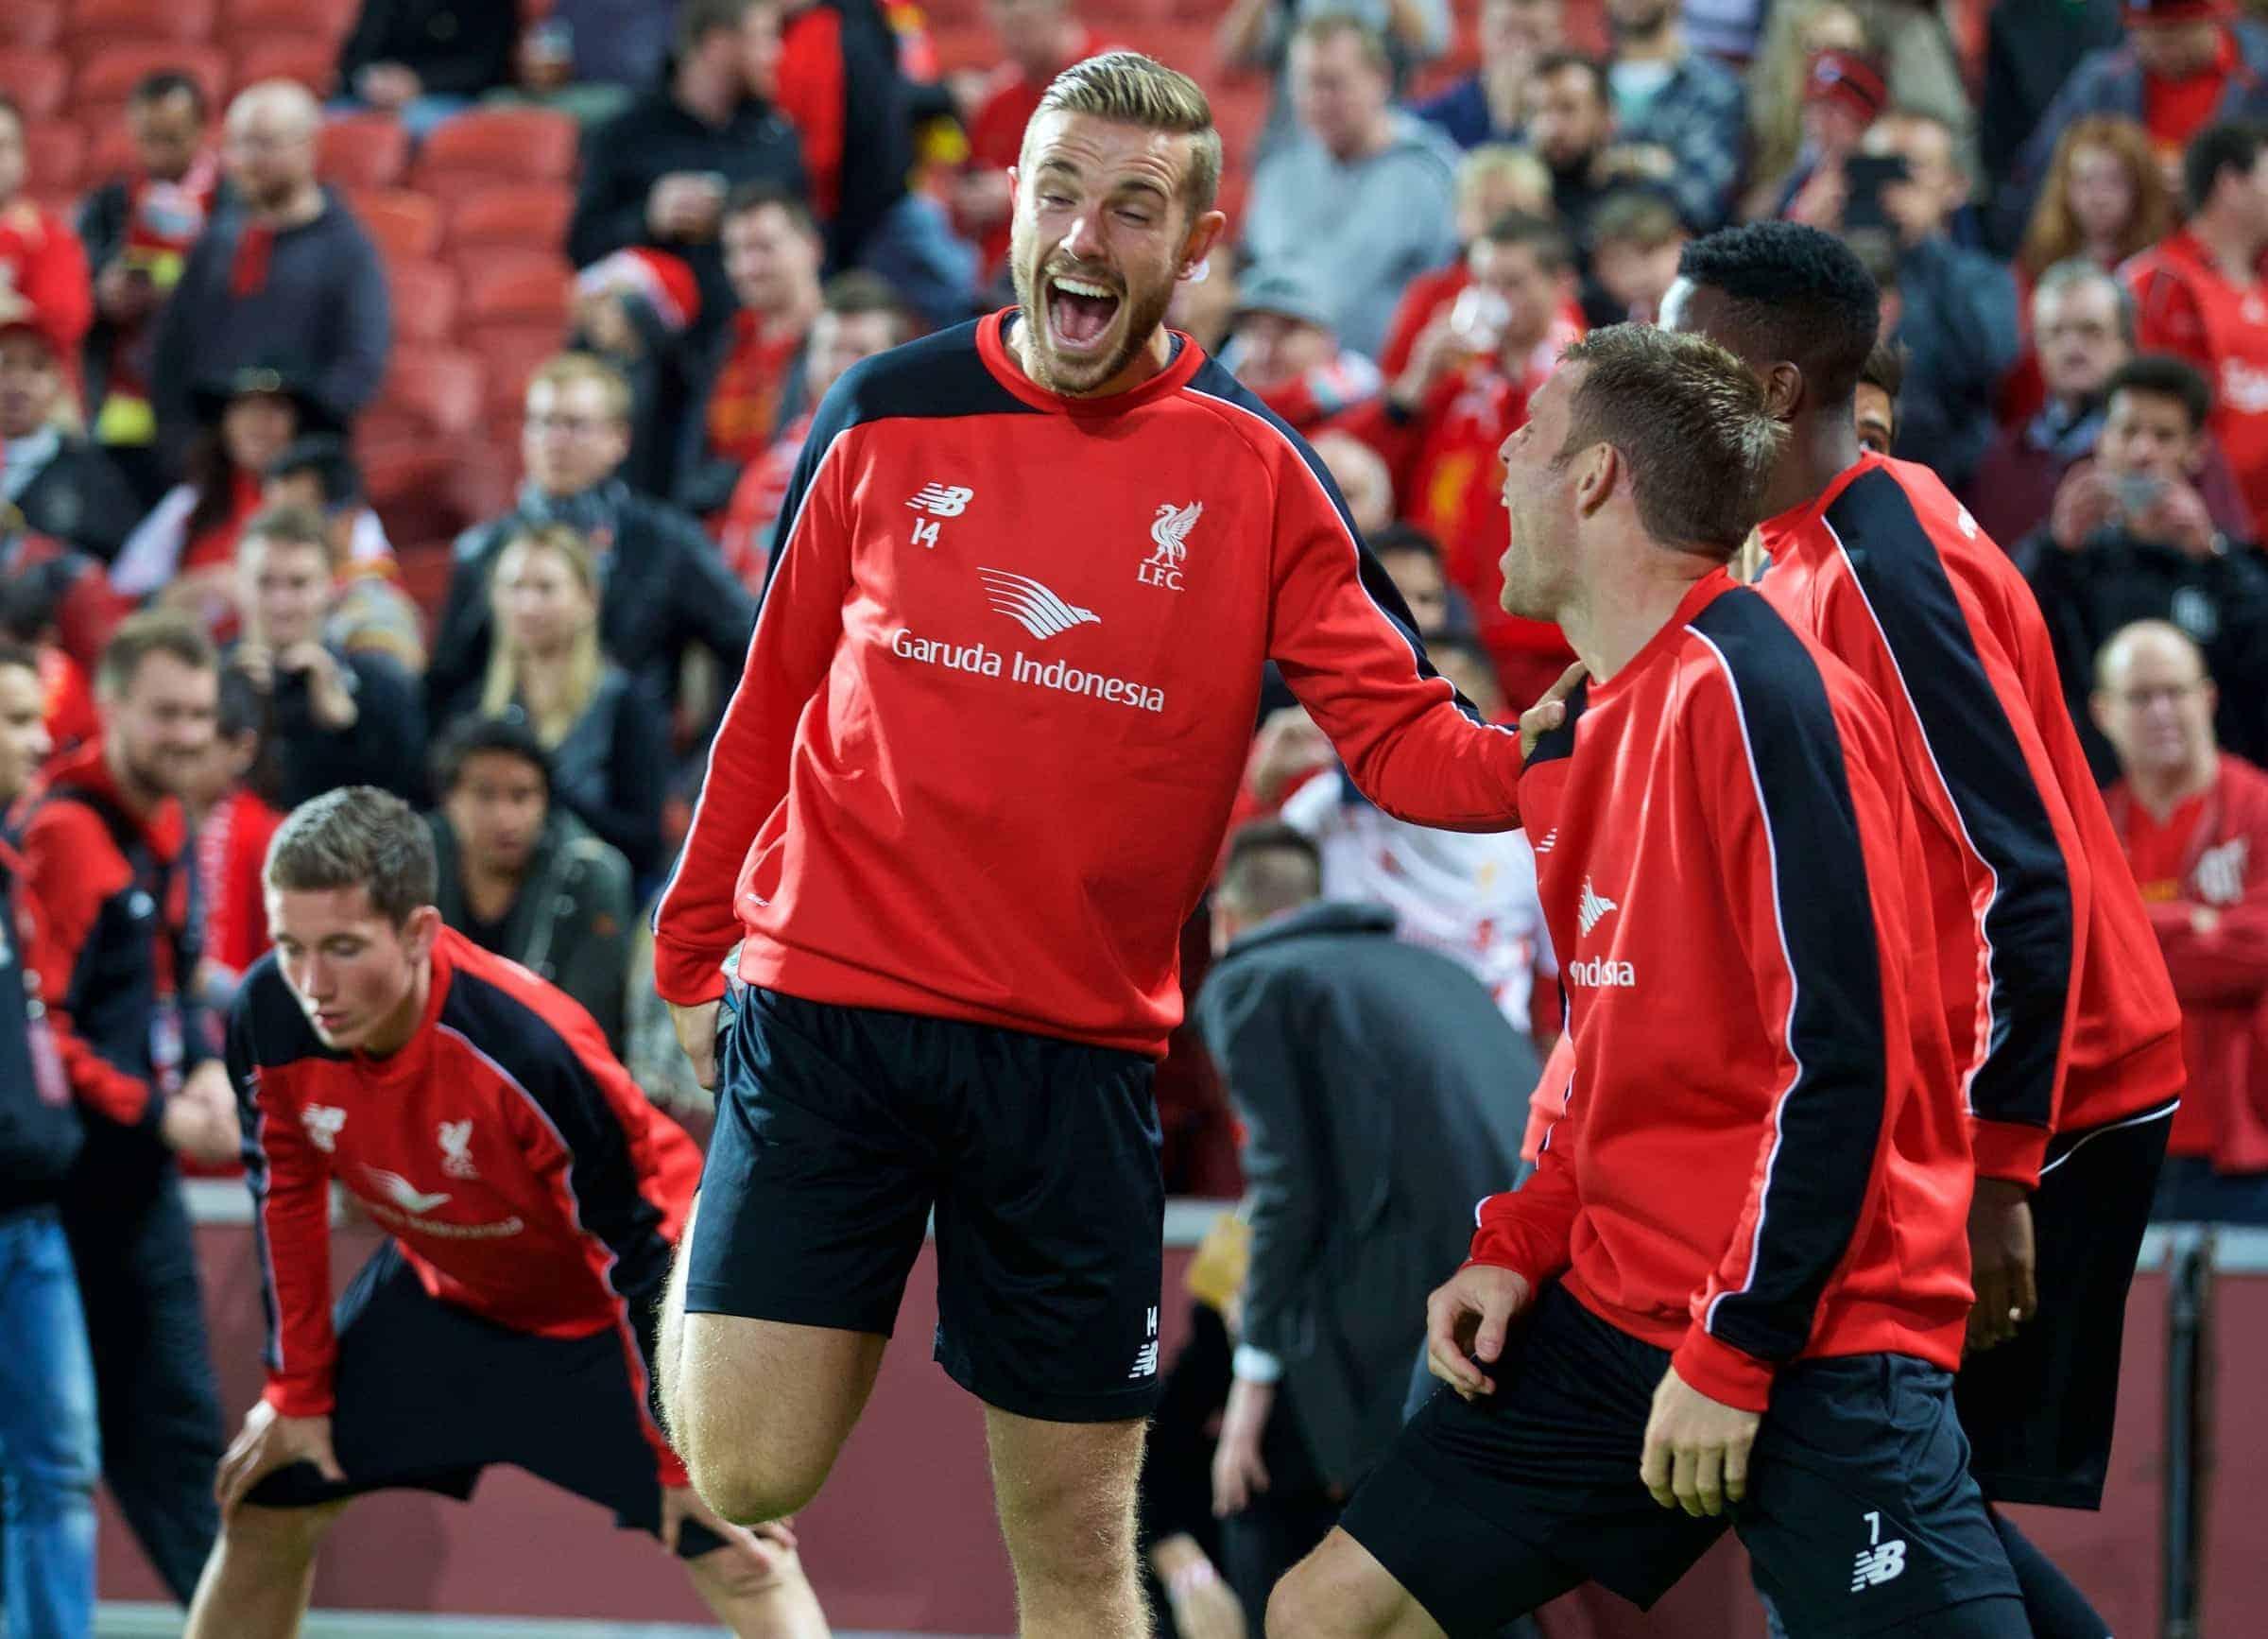 Football - Liverpool FC Preseason Tour 2015 - Day 4